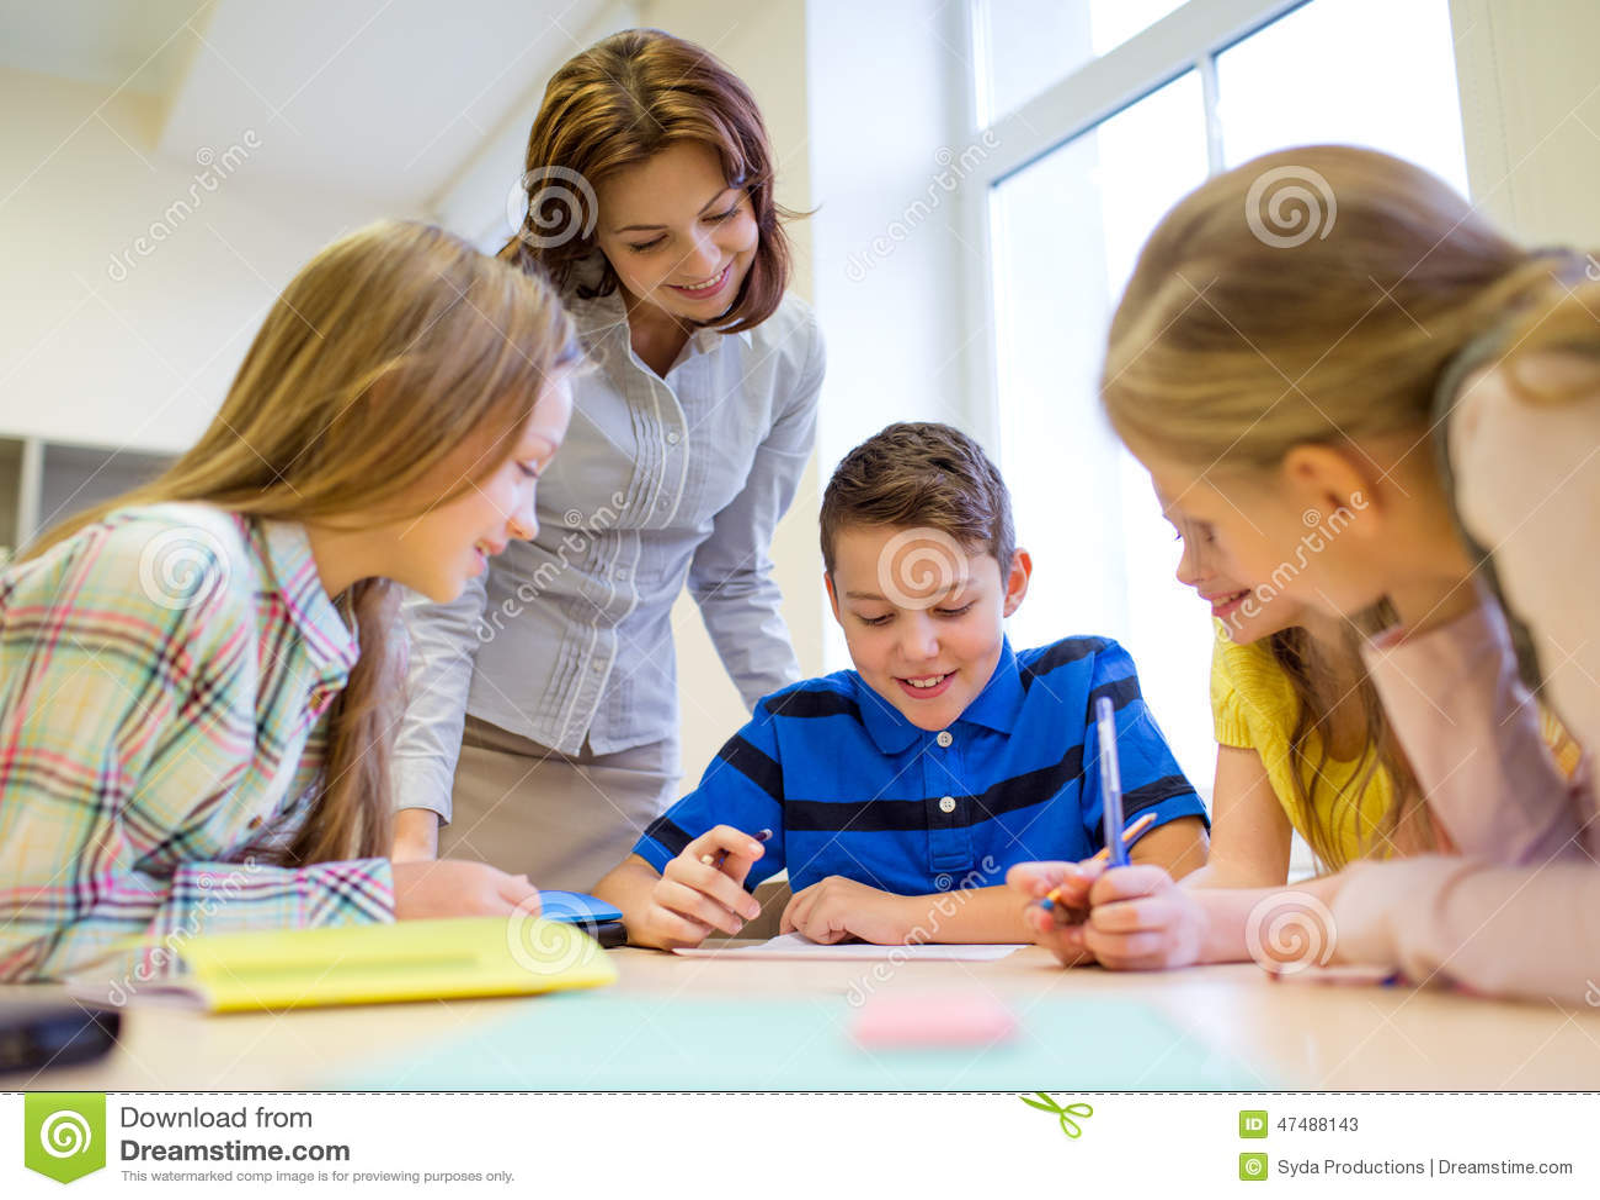 essay test for elementary